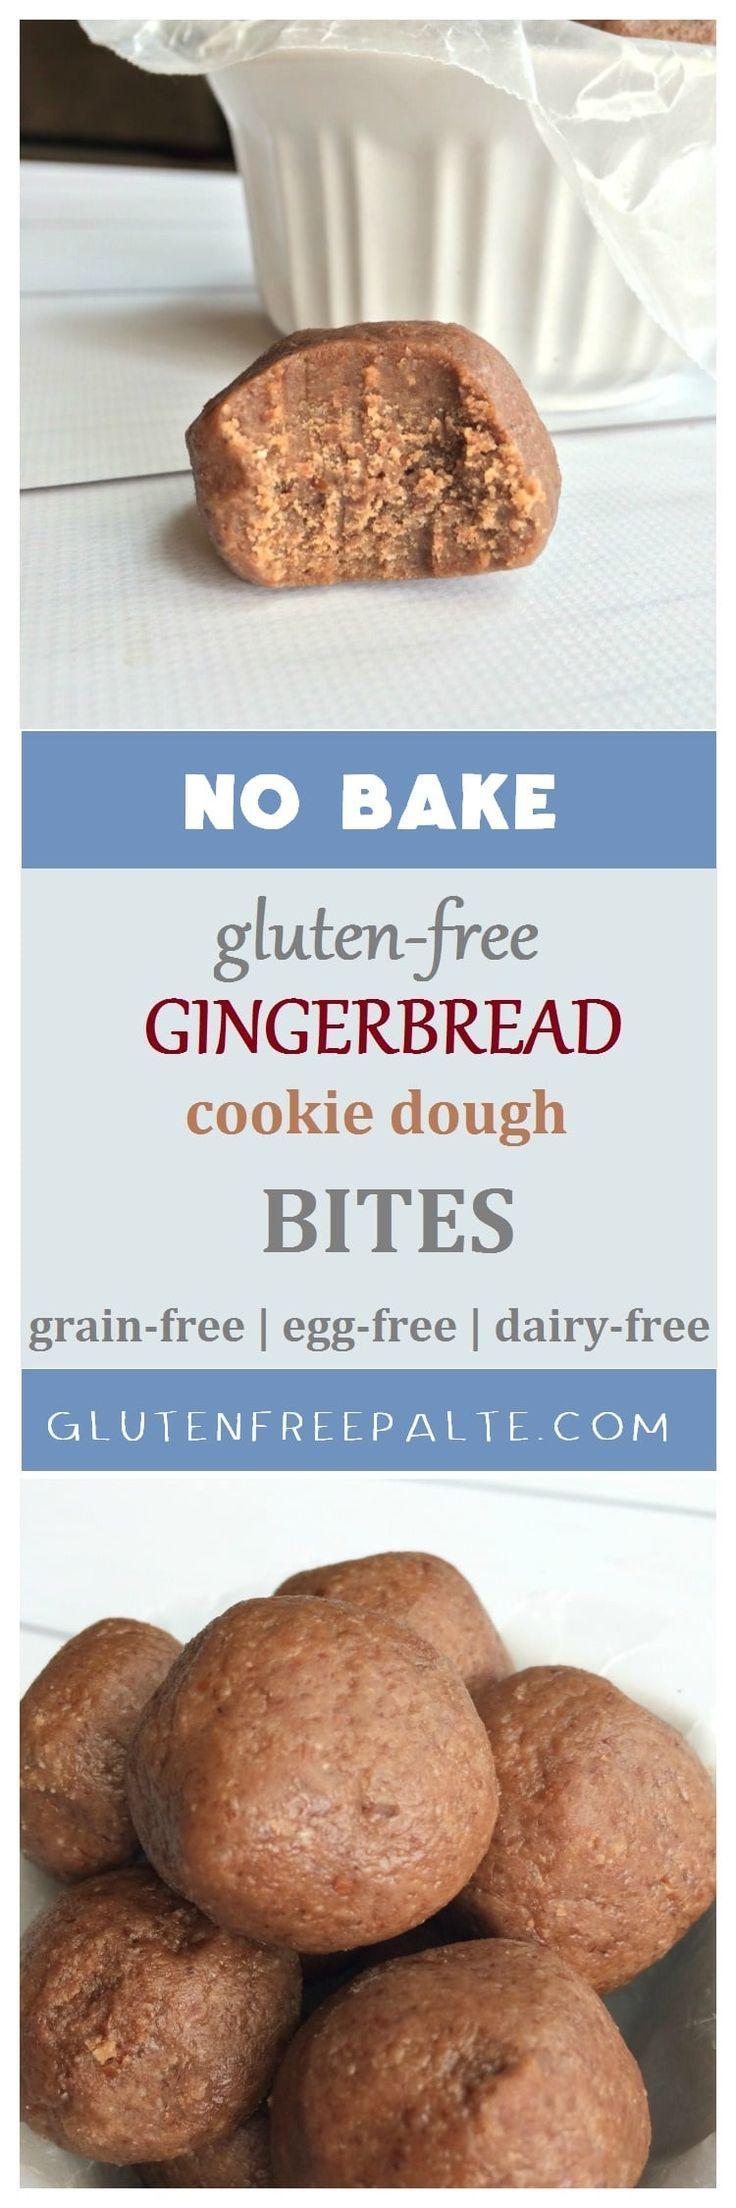 No Bake Gluten Free Gingerbread Cookie Dough Bites